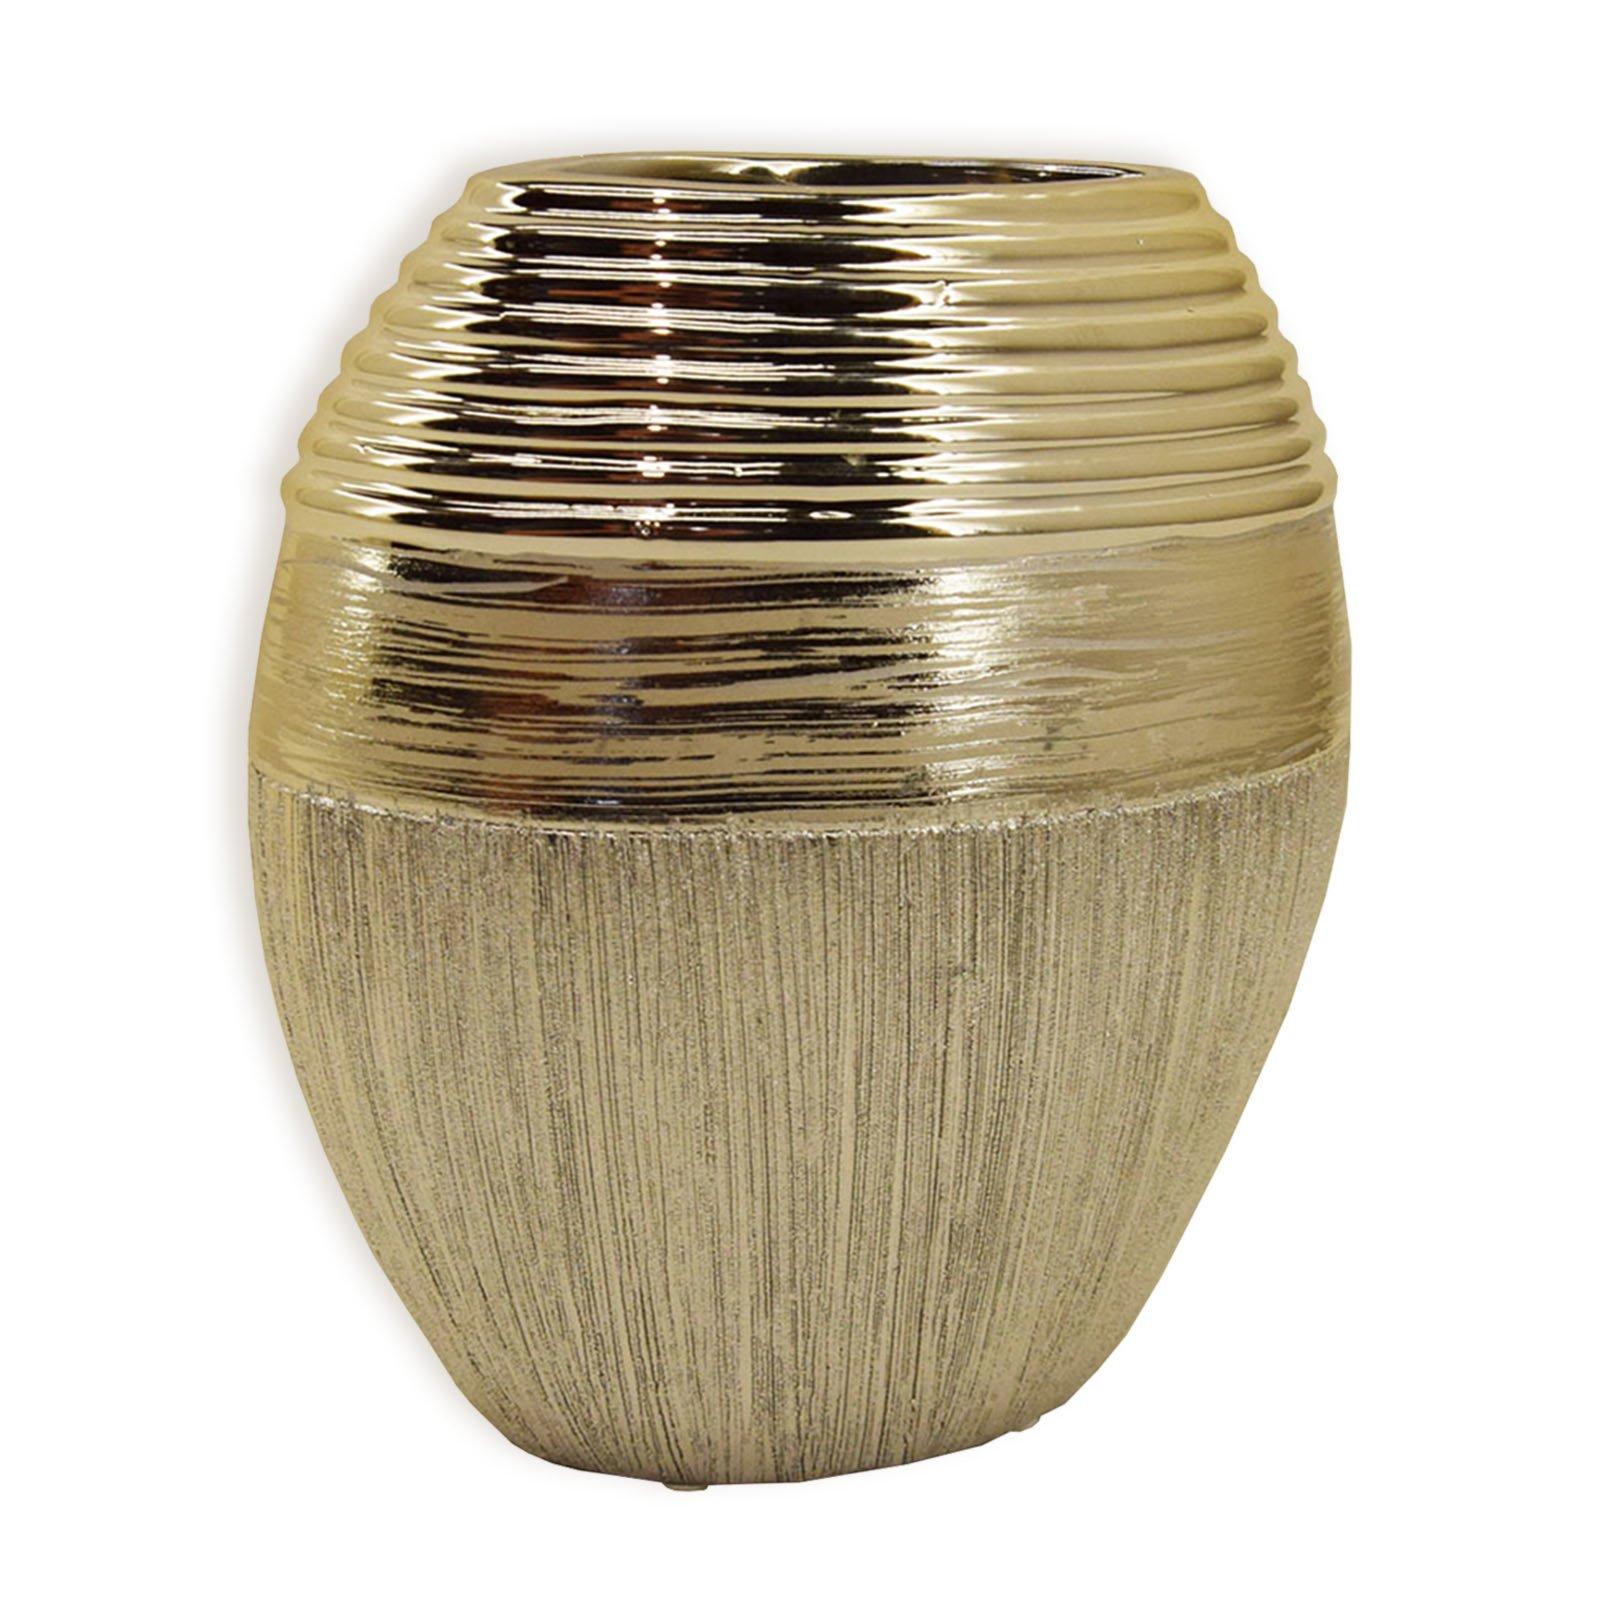 Vase - gold - 22 cm